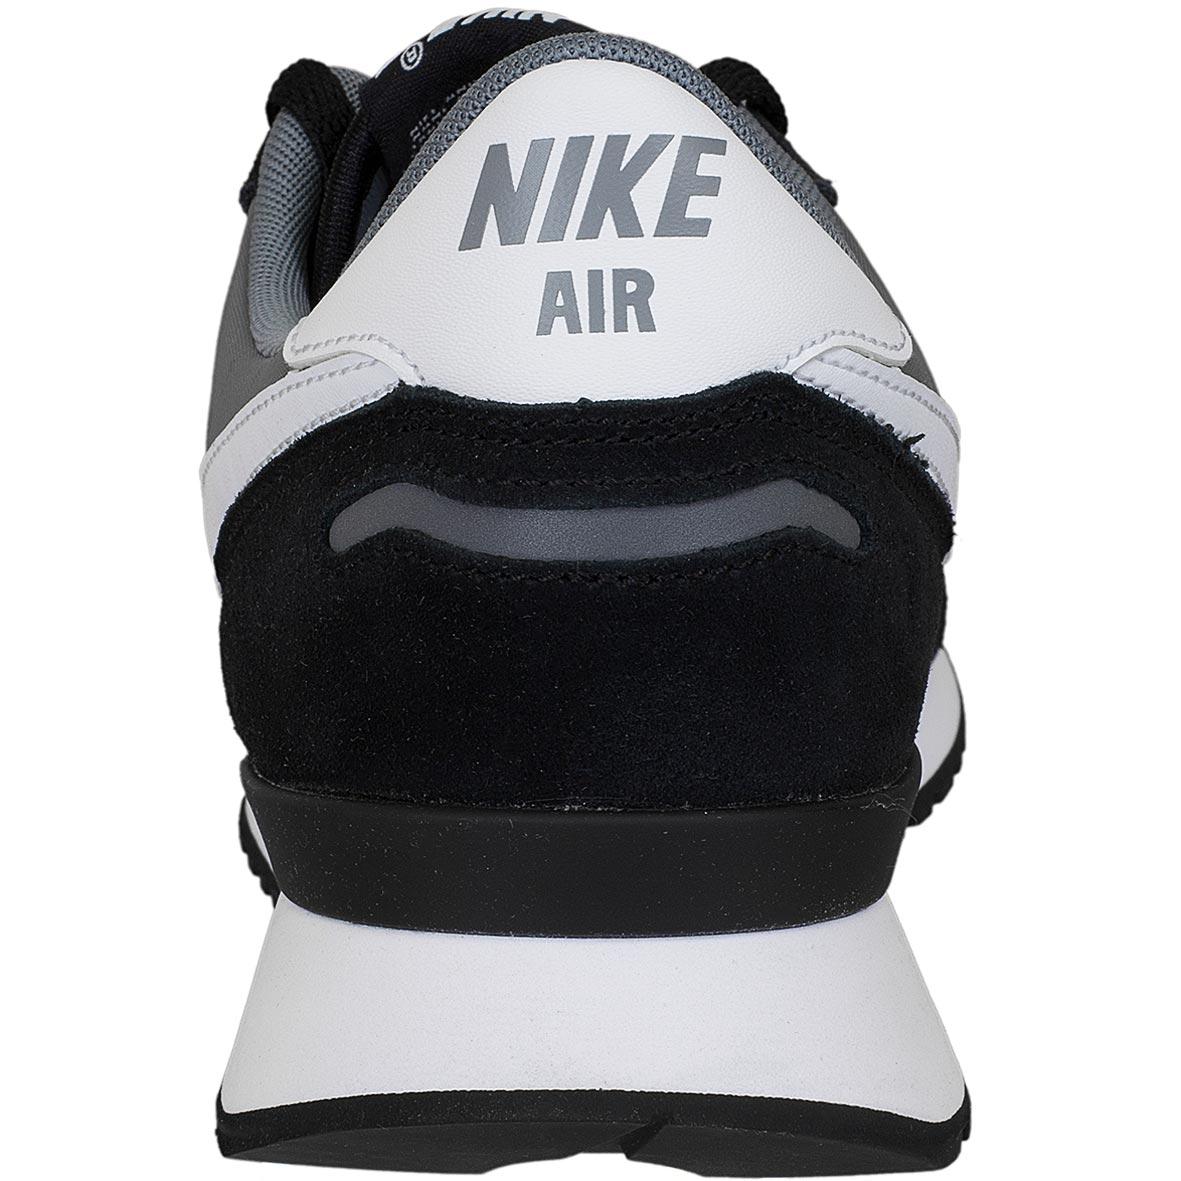 Nike Sneaker Schwarzweiß Neu 8cph83us Vortex Air L4A5Rj